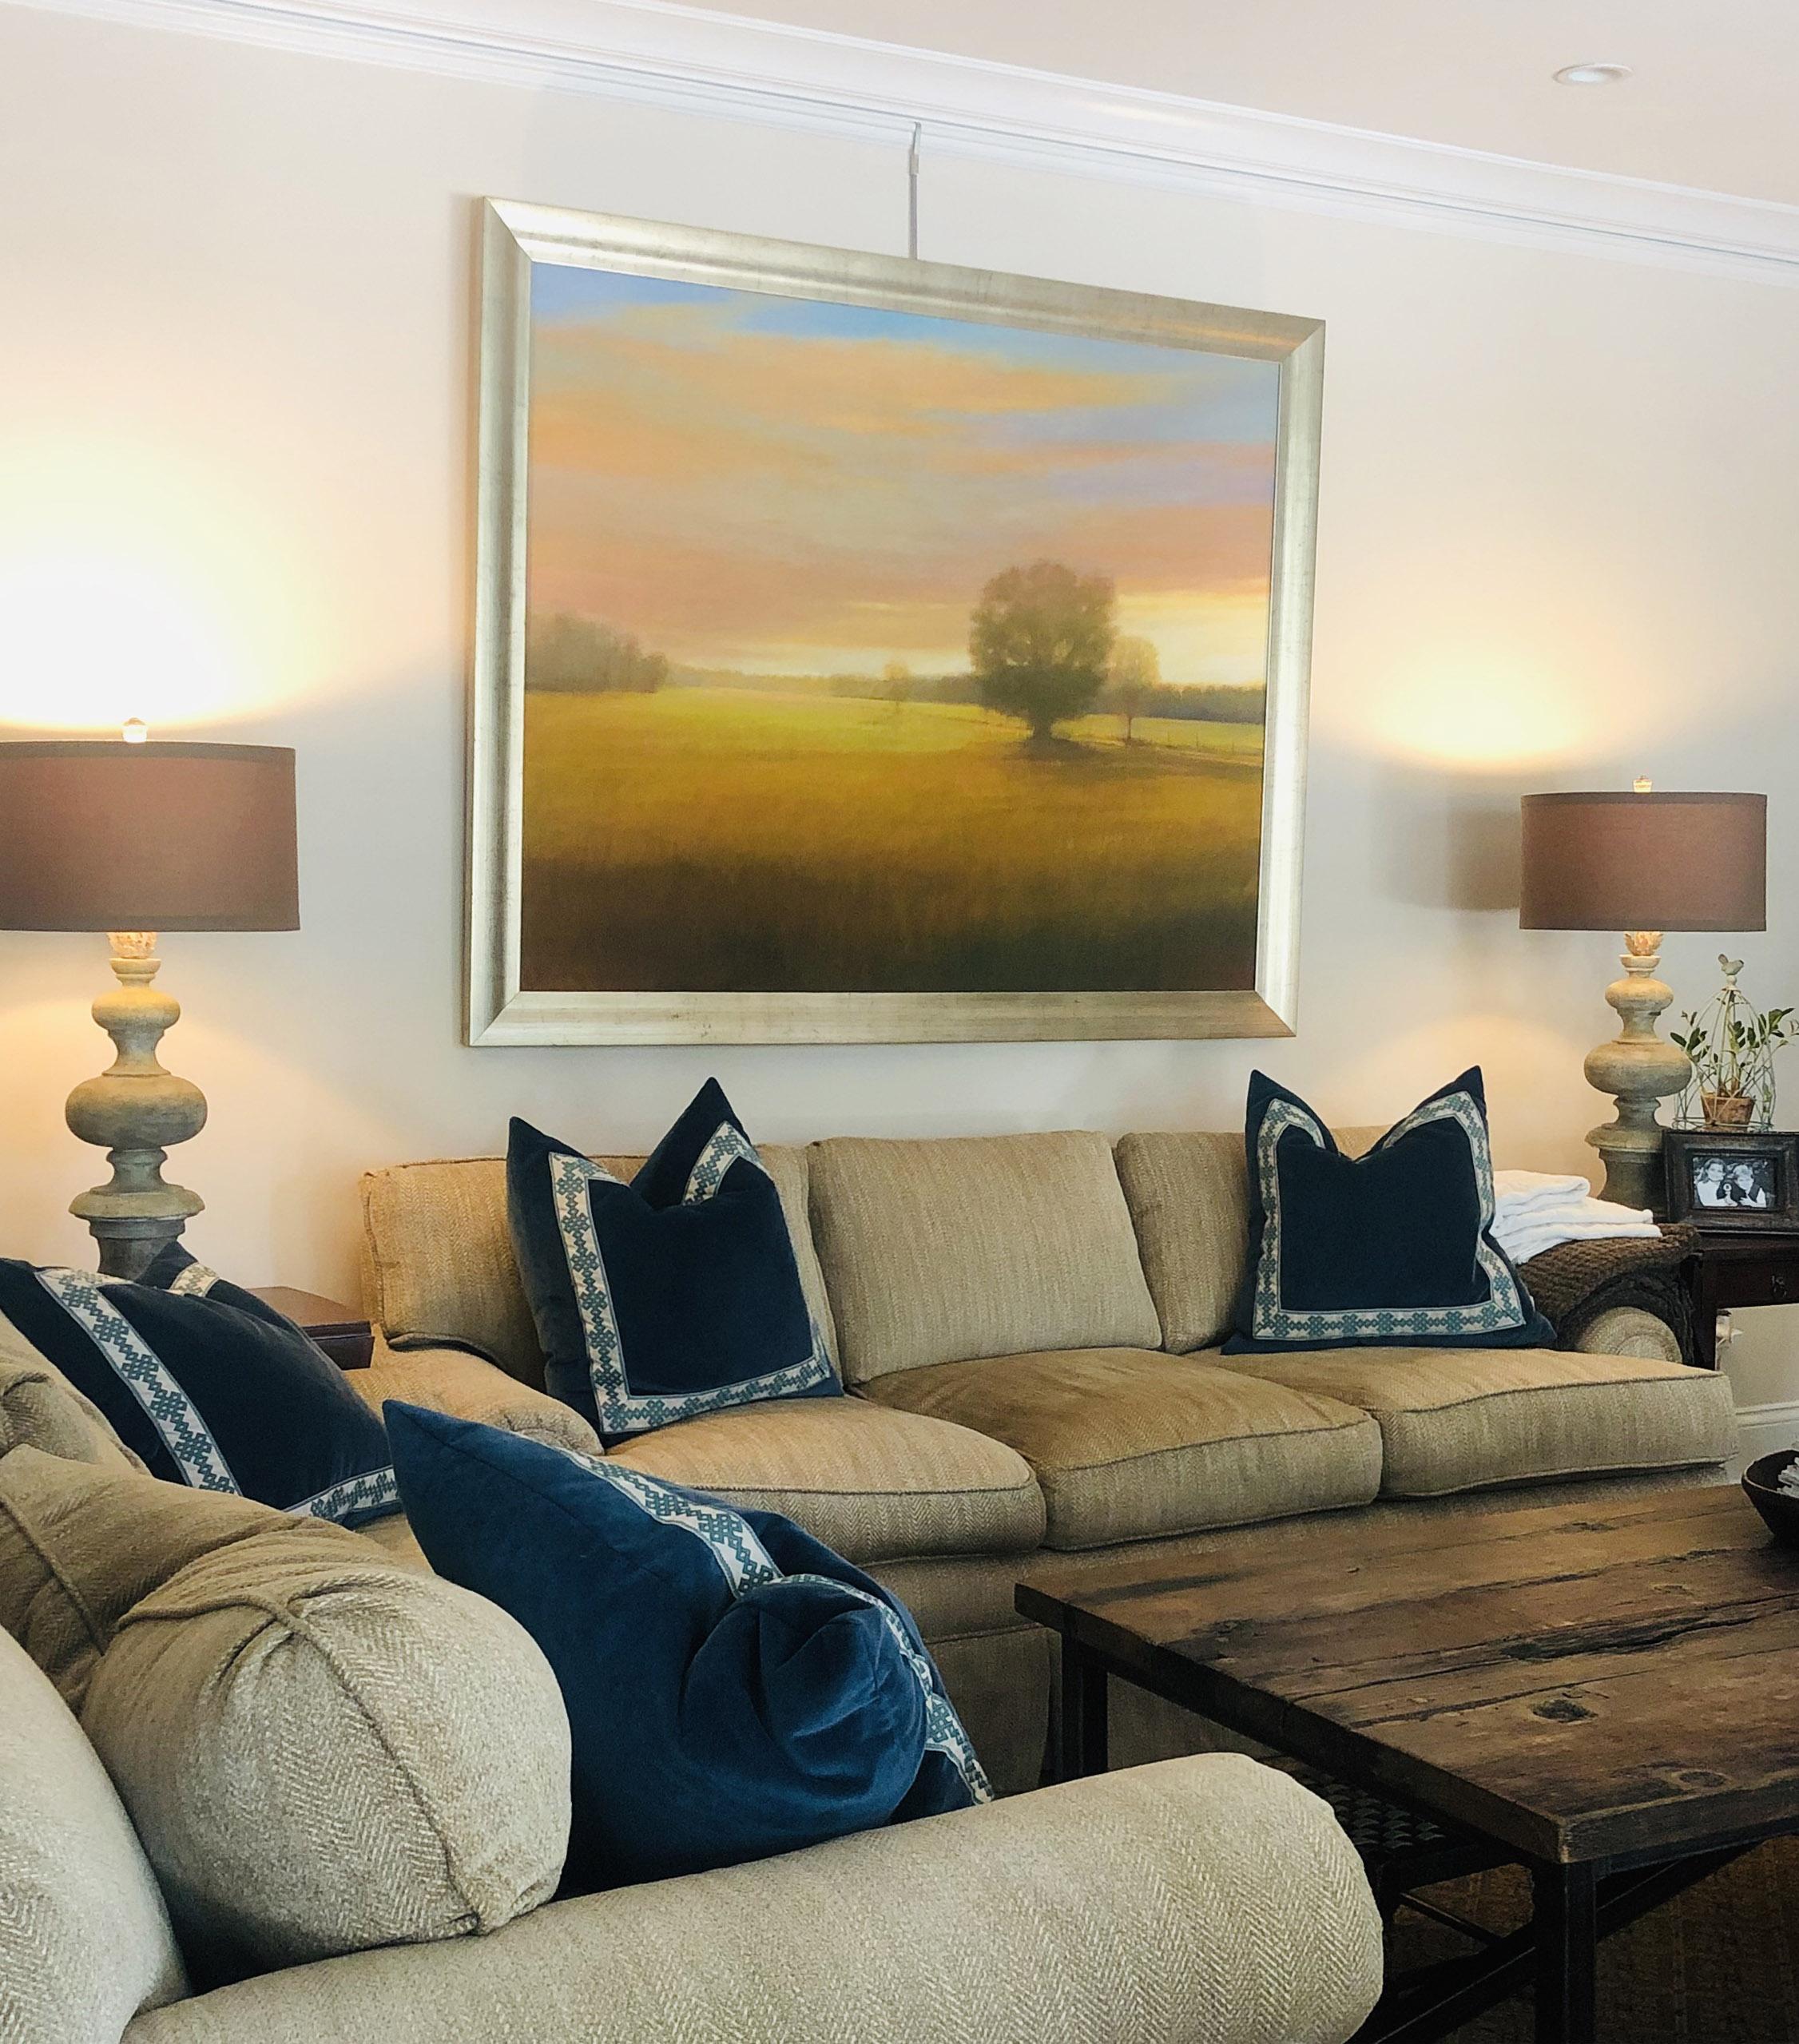 Stephen Bach Private Residence Atlanta, GA